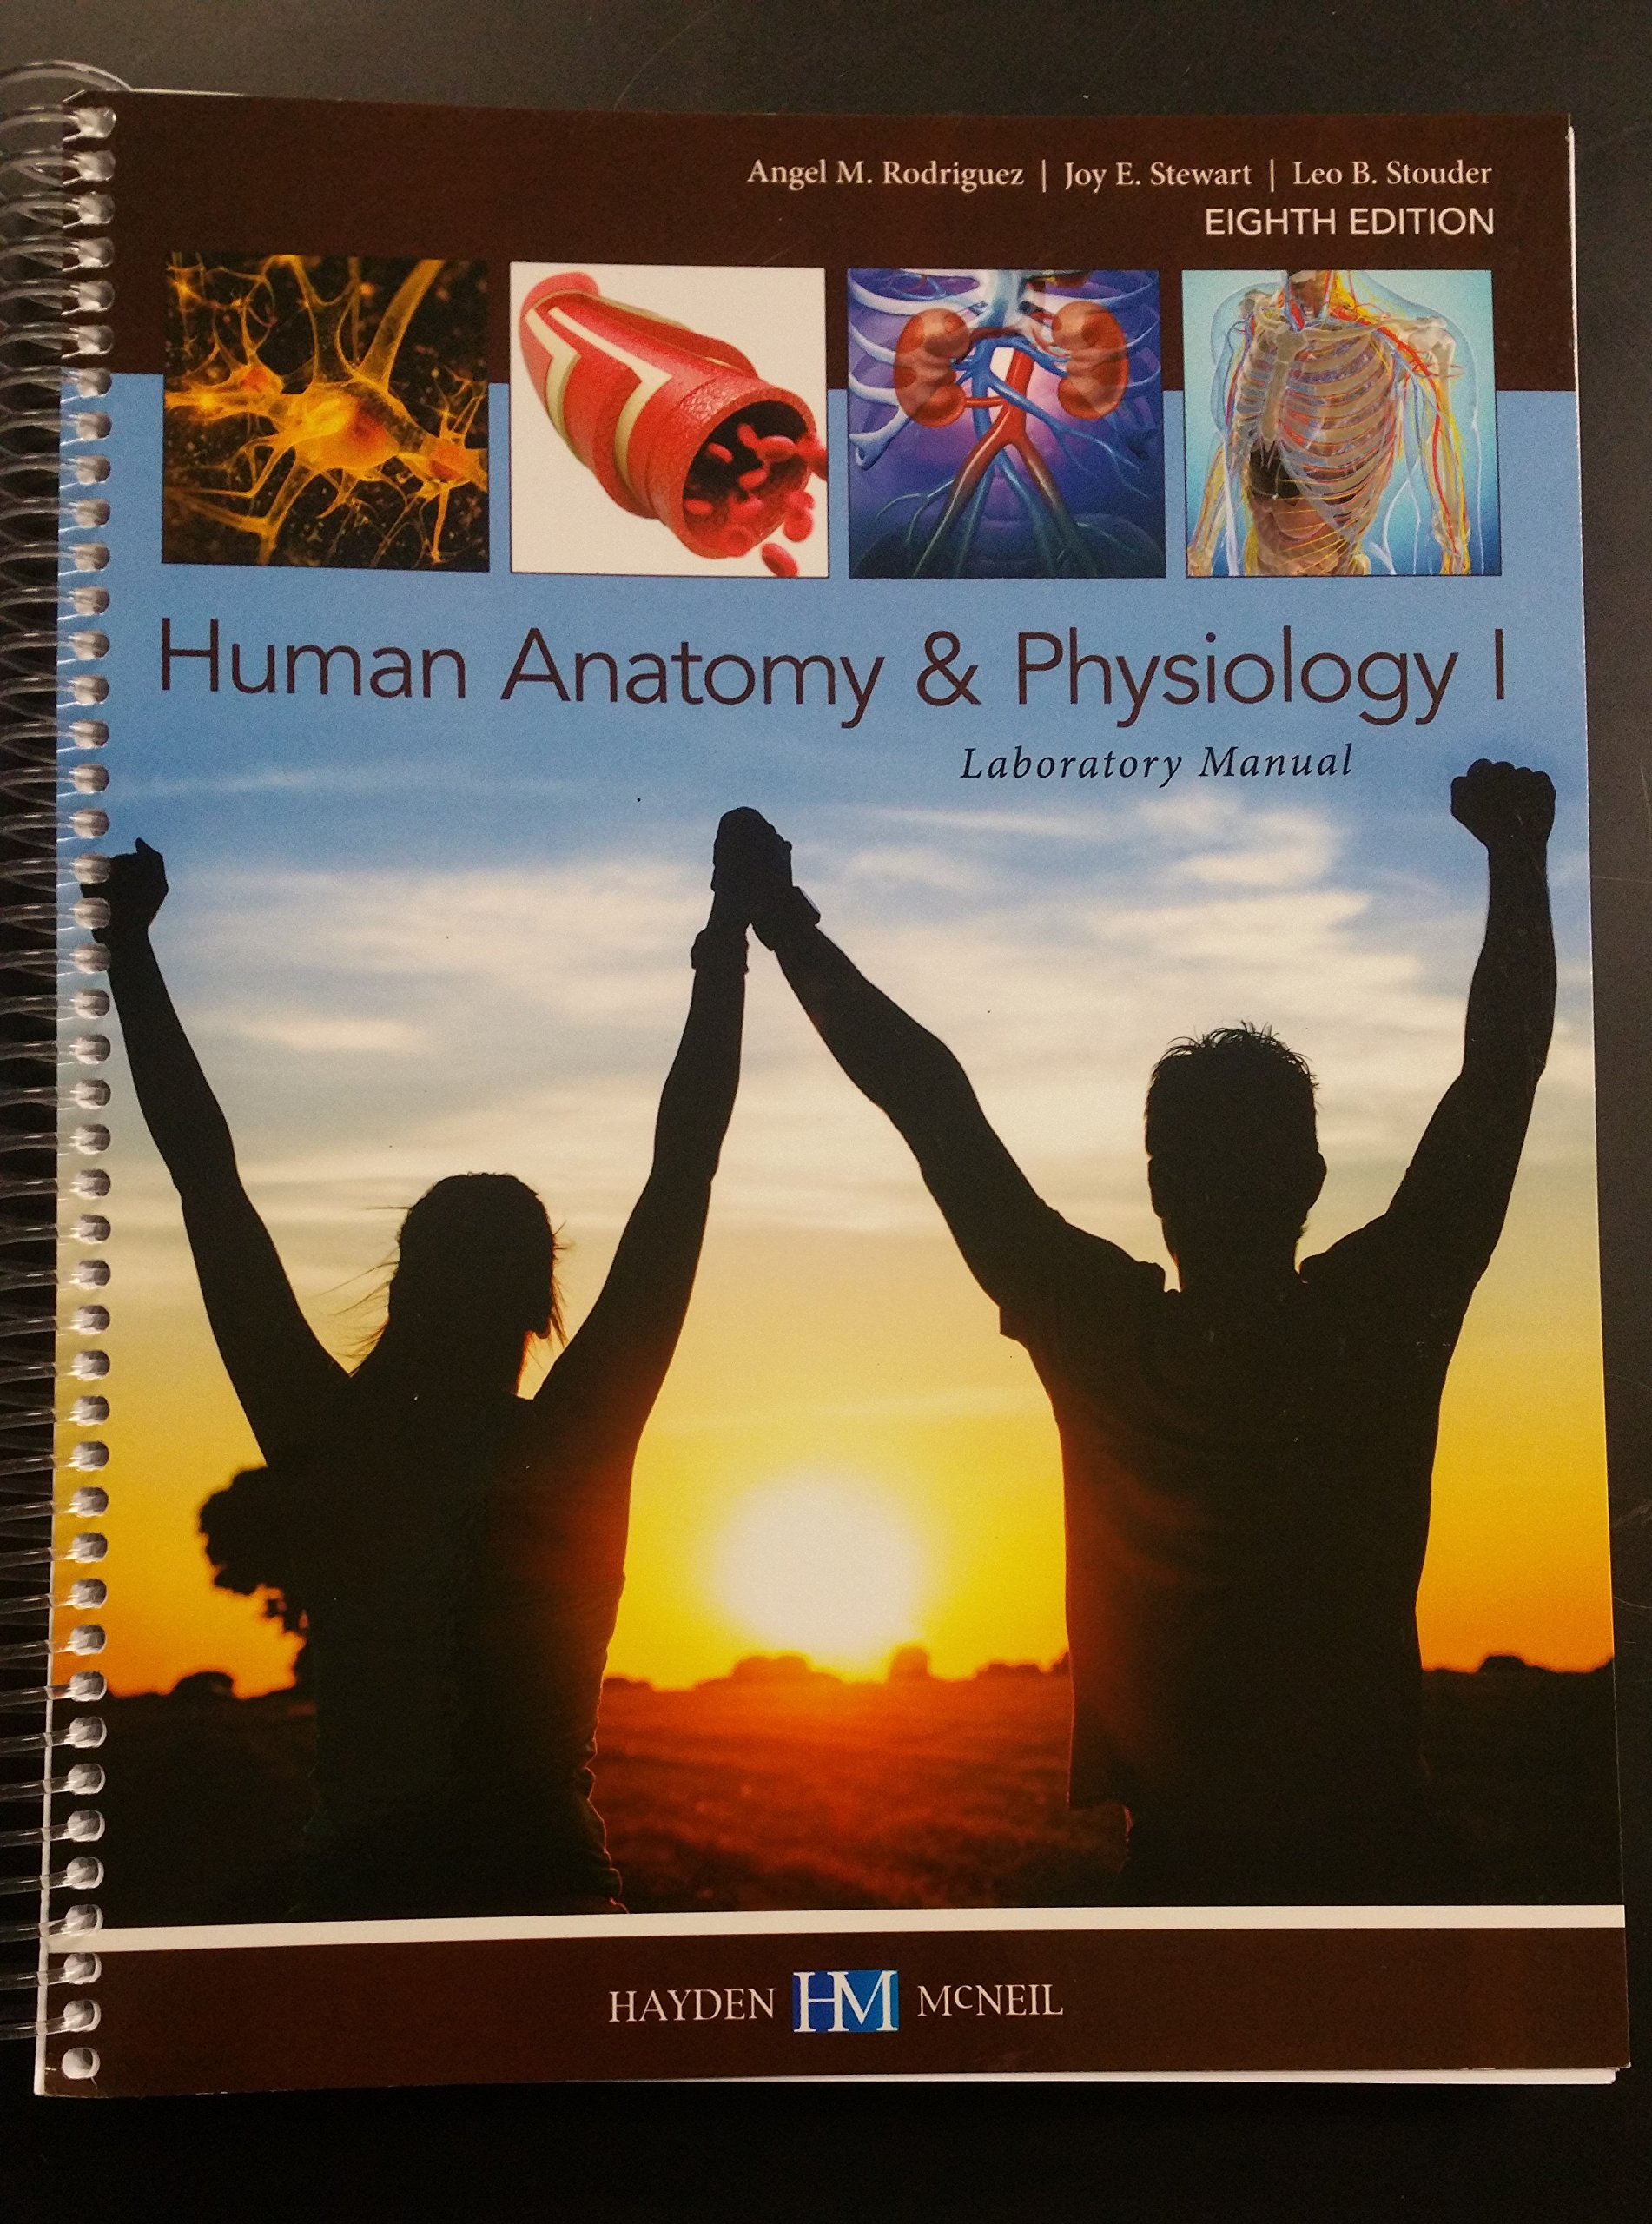 Human Anatomy and Physiology 1, Laboratory Manual, 8 edition: Joy E.  Stewart, Leo B. Stouder Angel M. Rodriguez: 9780738080055: Amazon.com: Books